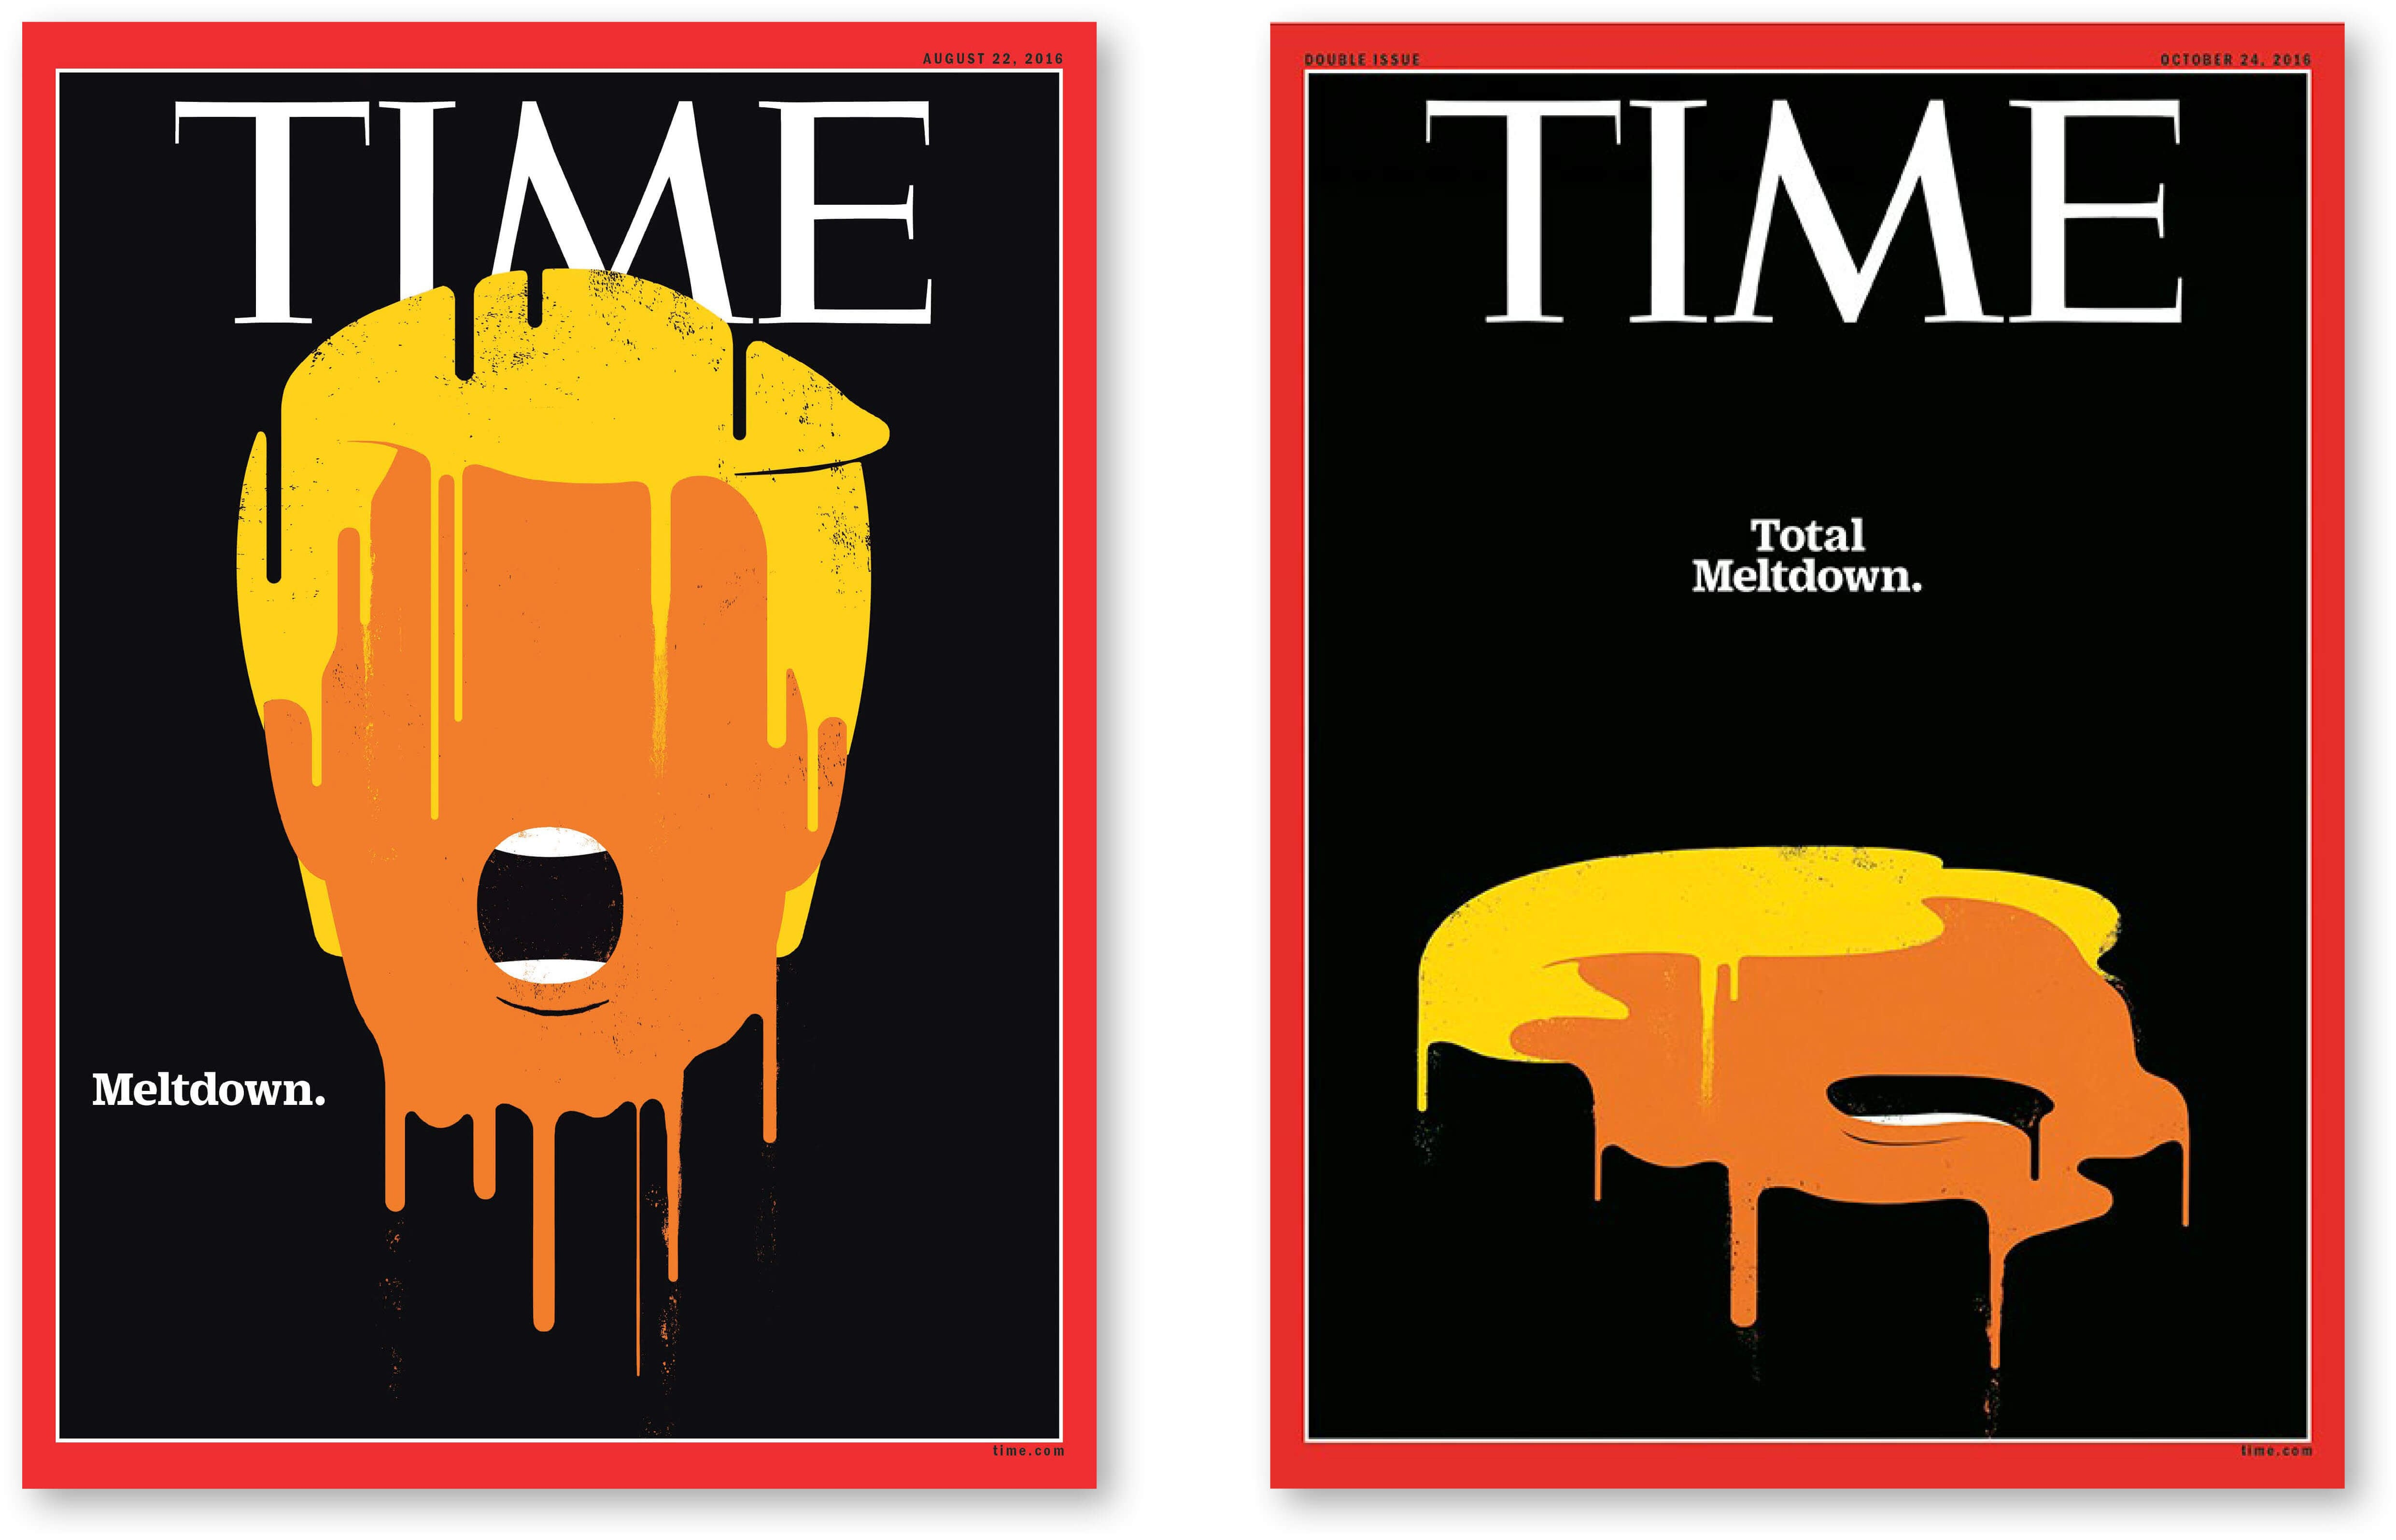 time-meltdown-and-total-meltdown